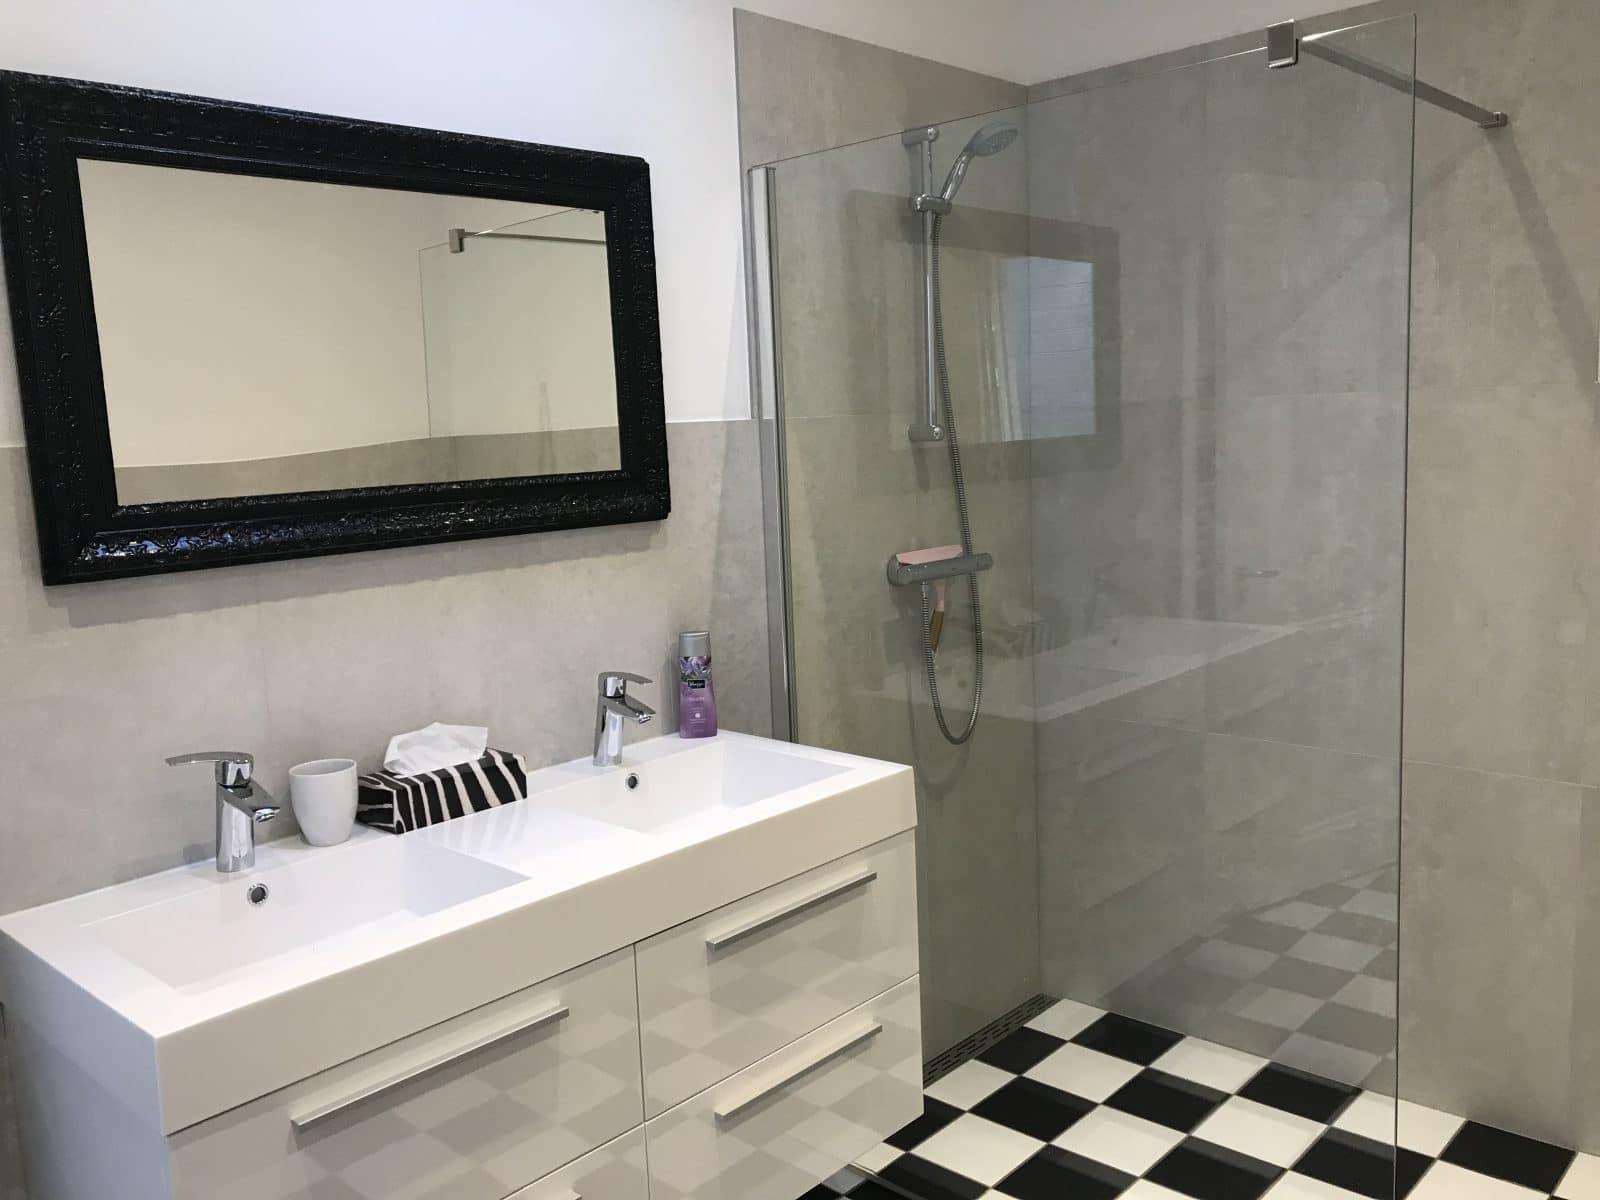 B&B Den Haag Valkenbos schone badkamer